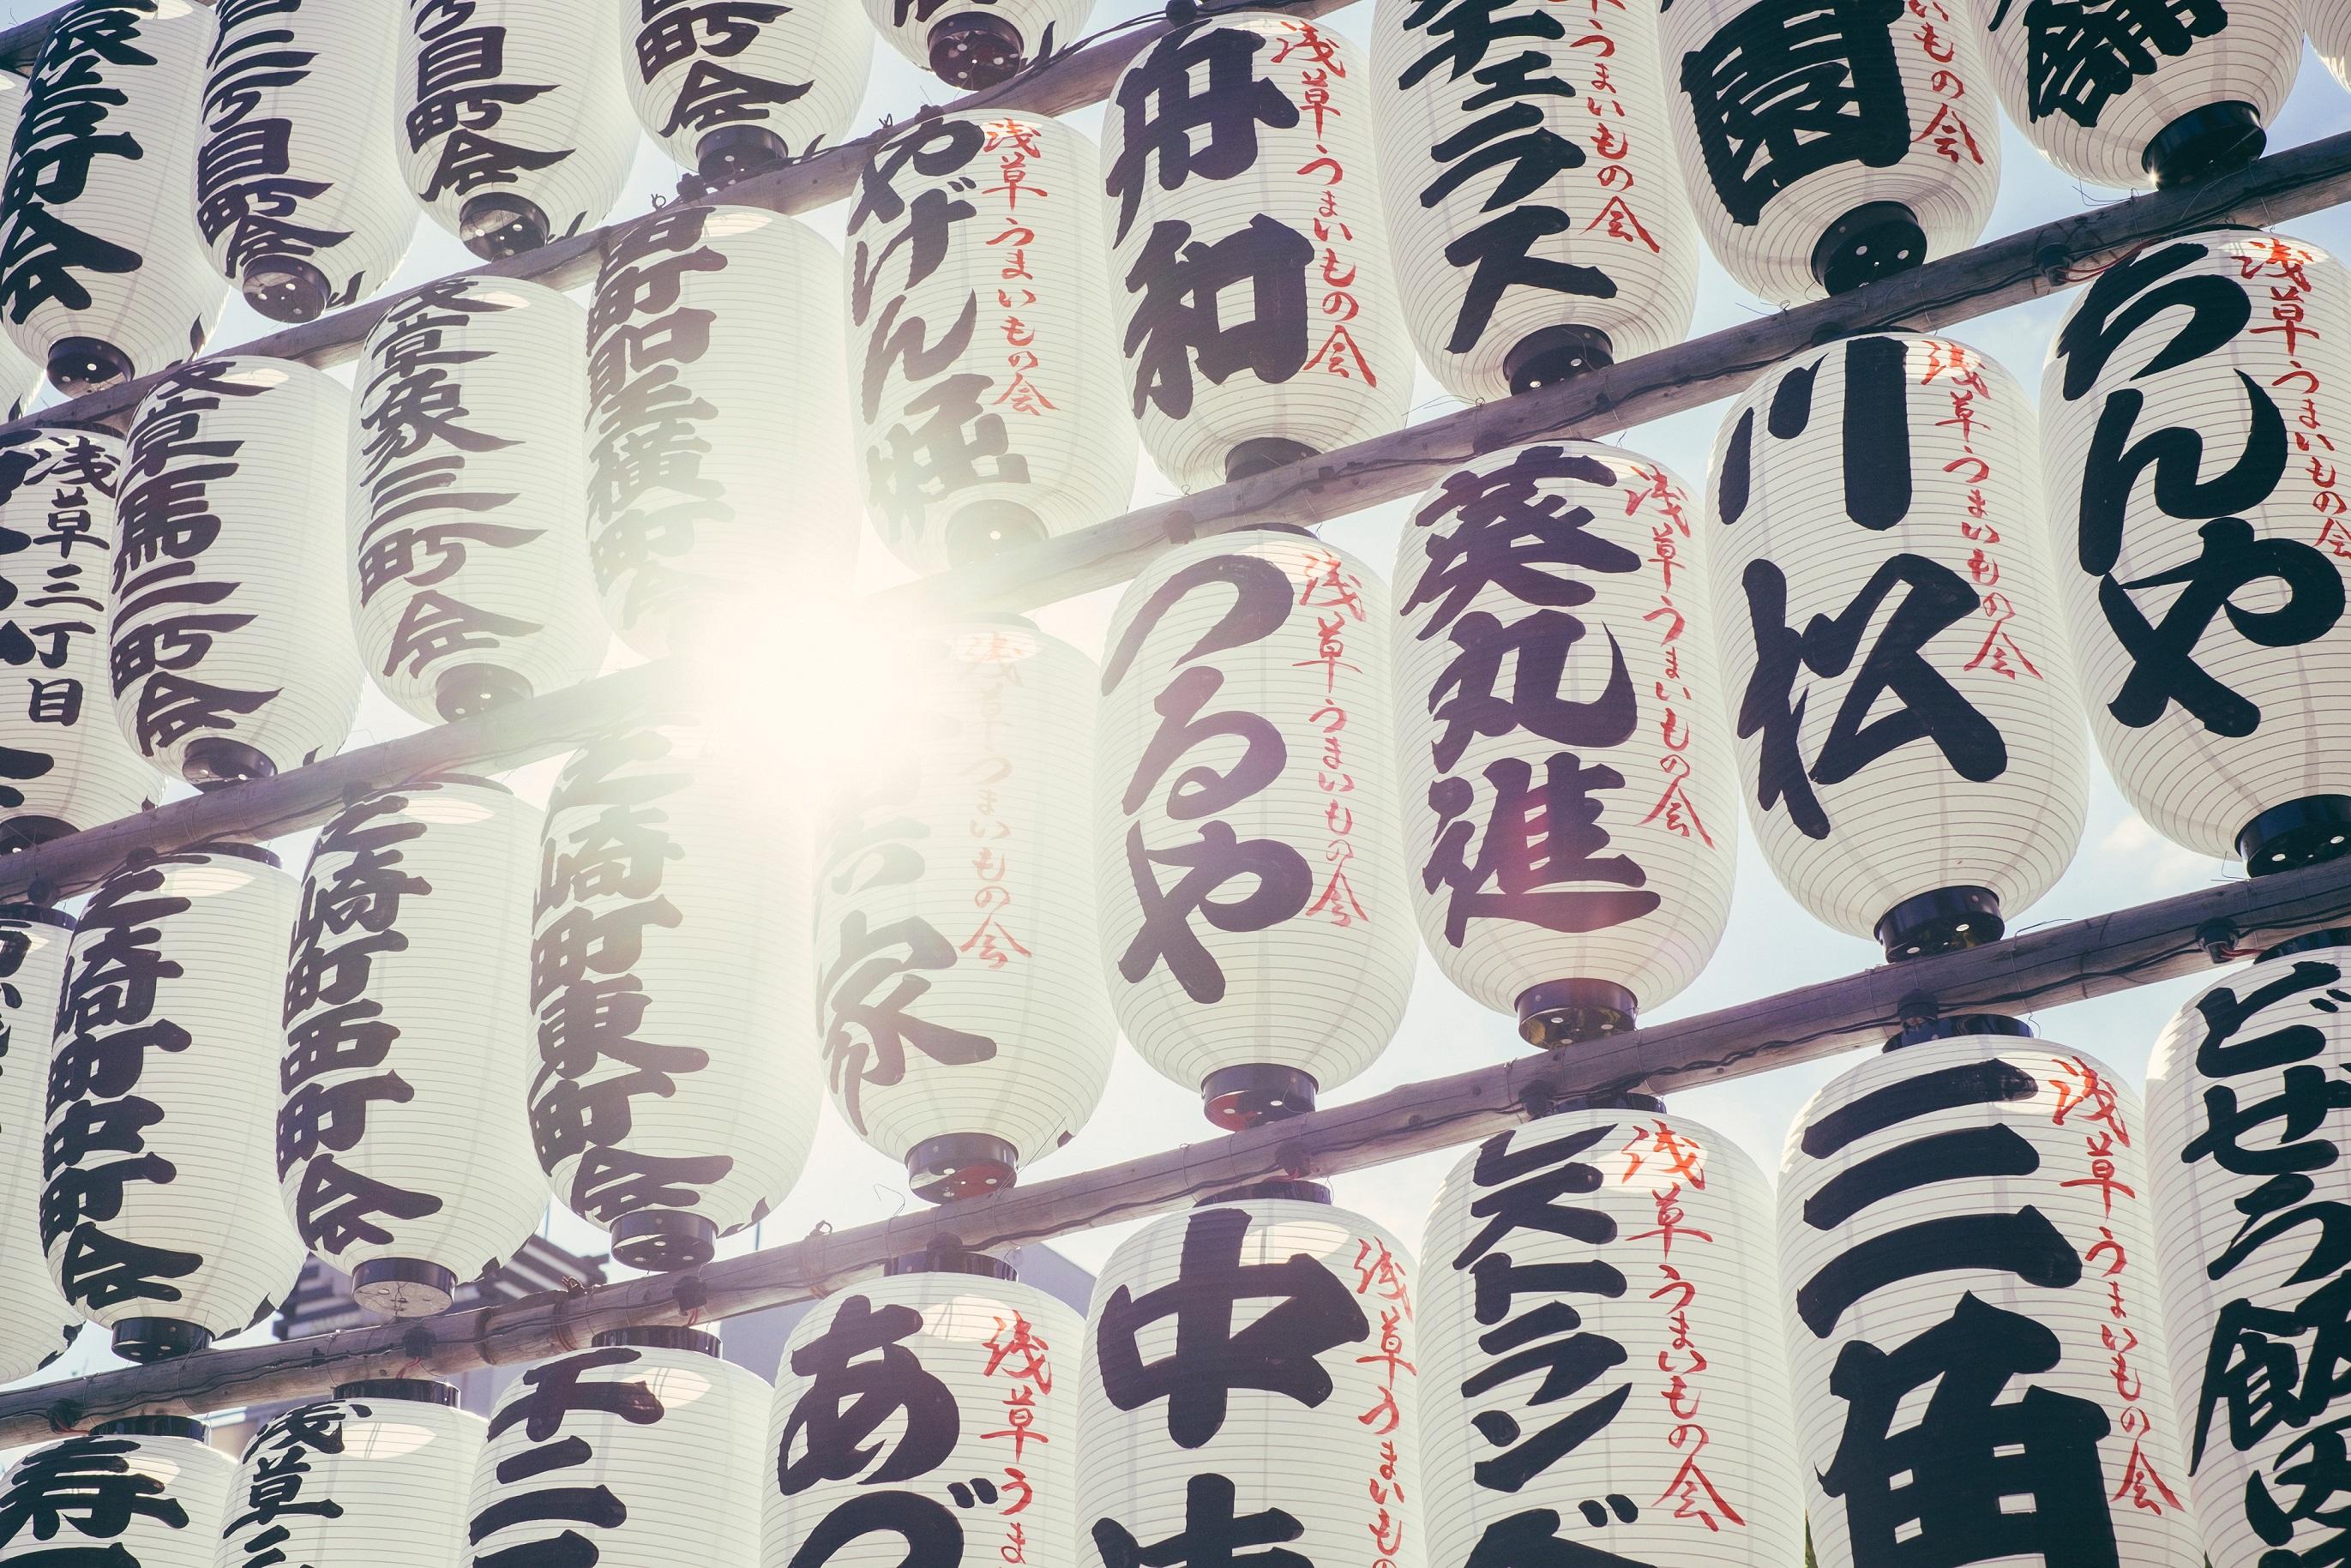 zodiac chinezesc - sfatulparintilor.ro - freddie-marriage-92609-unsplash